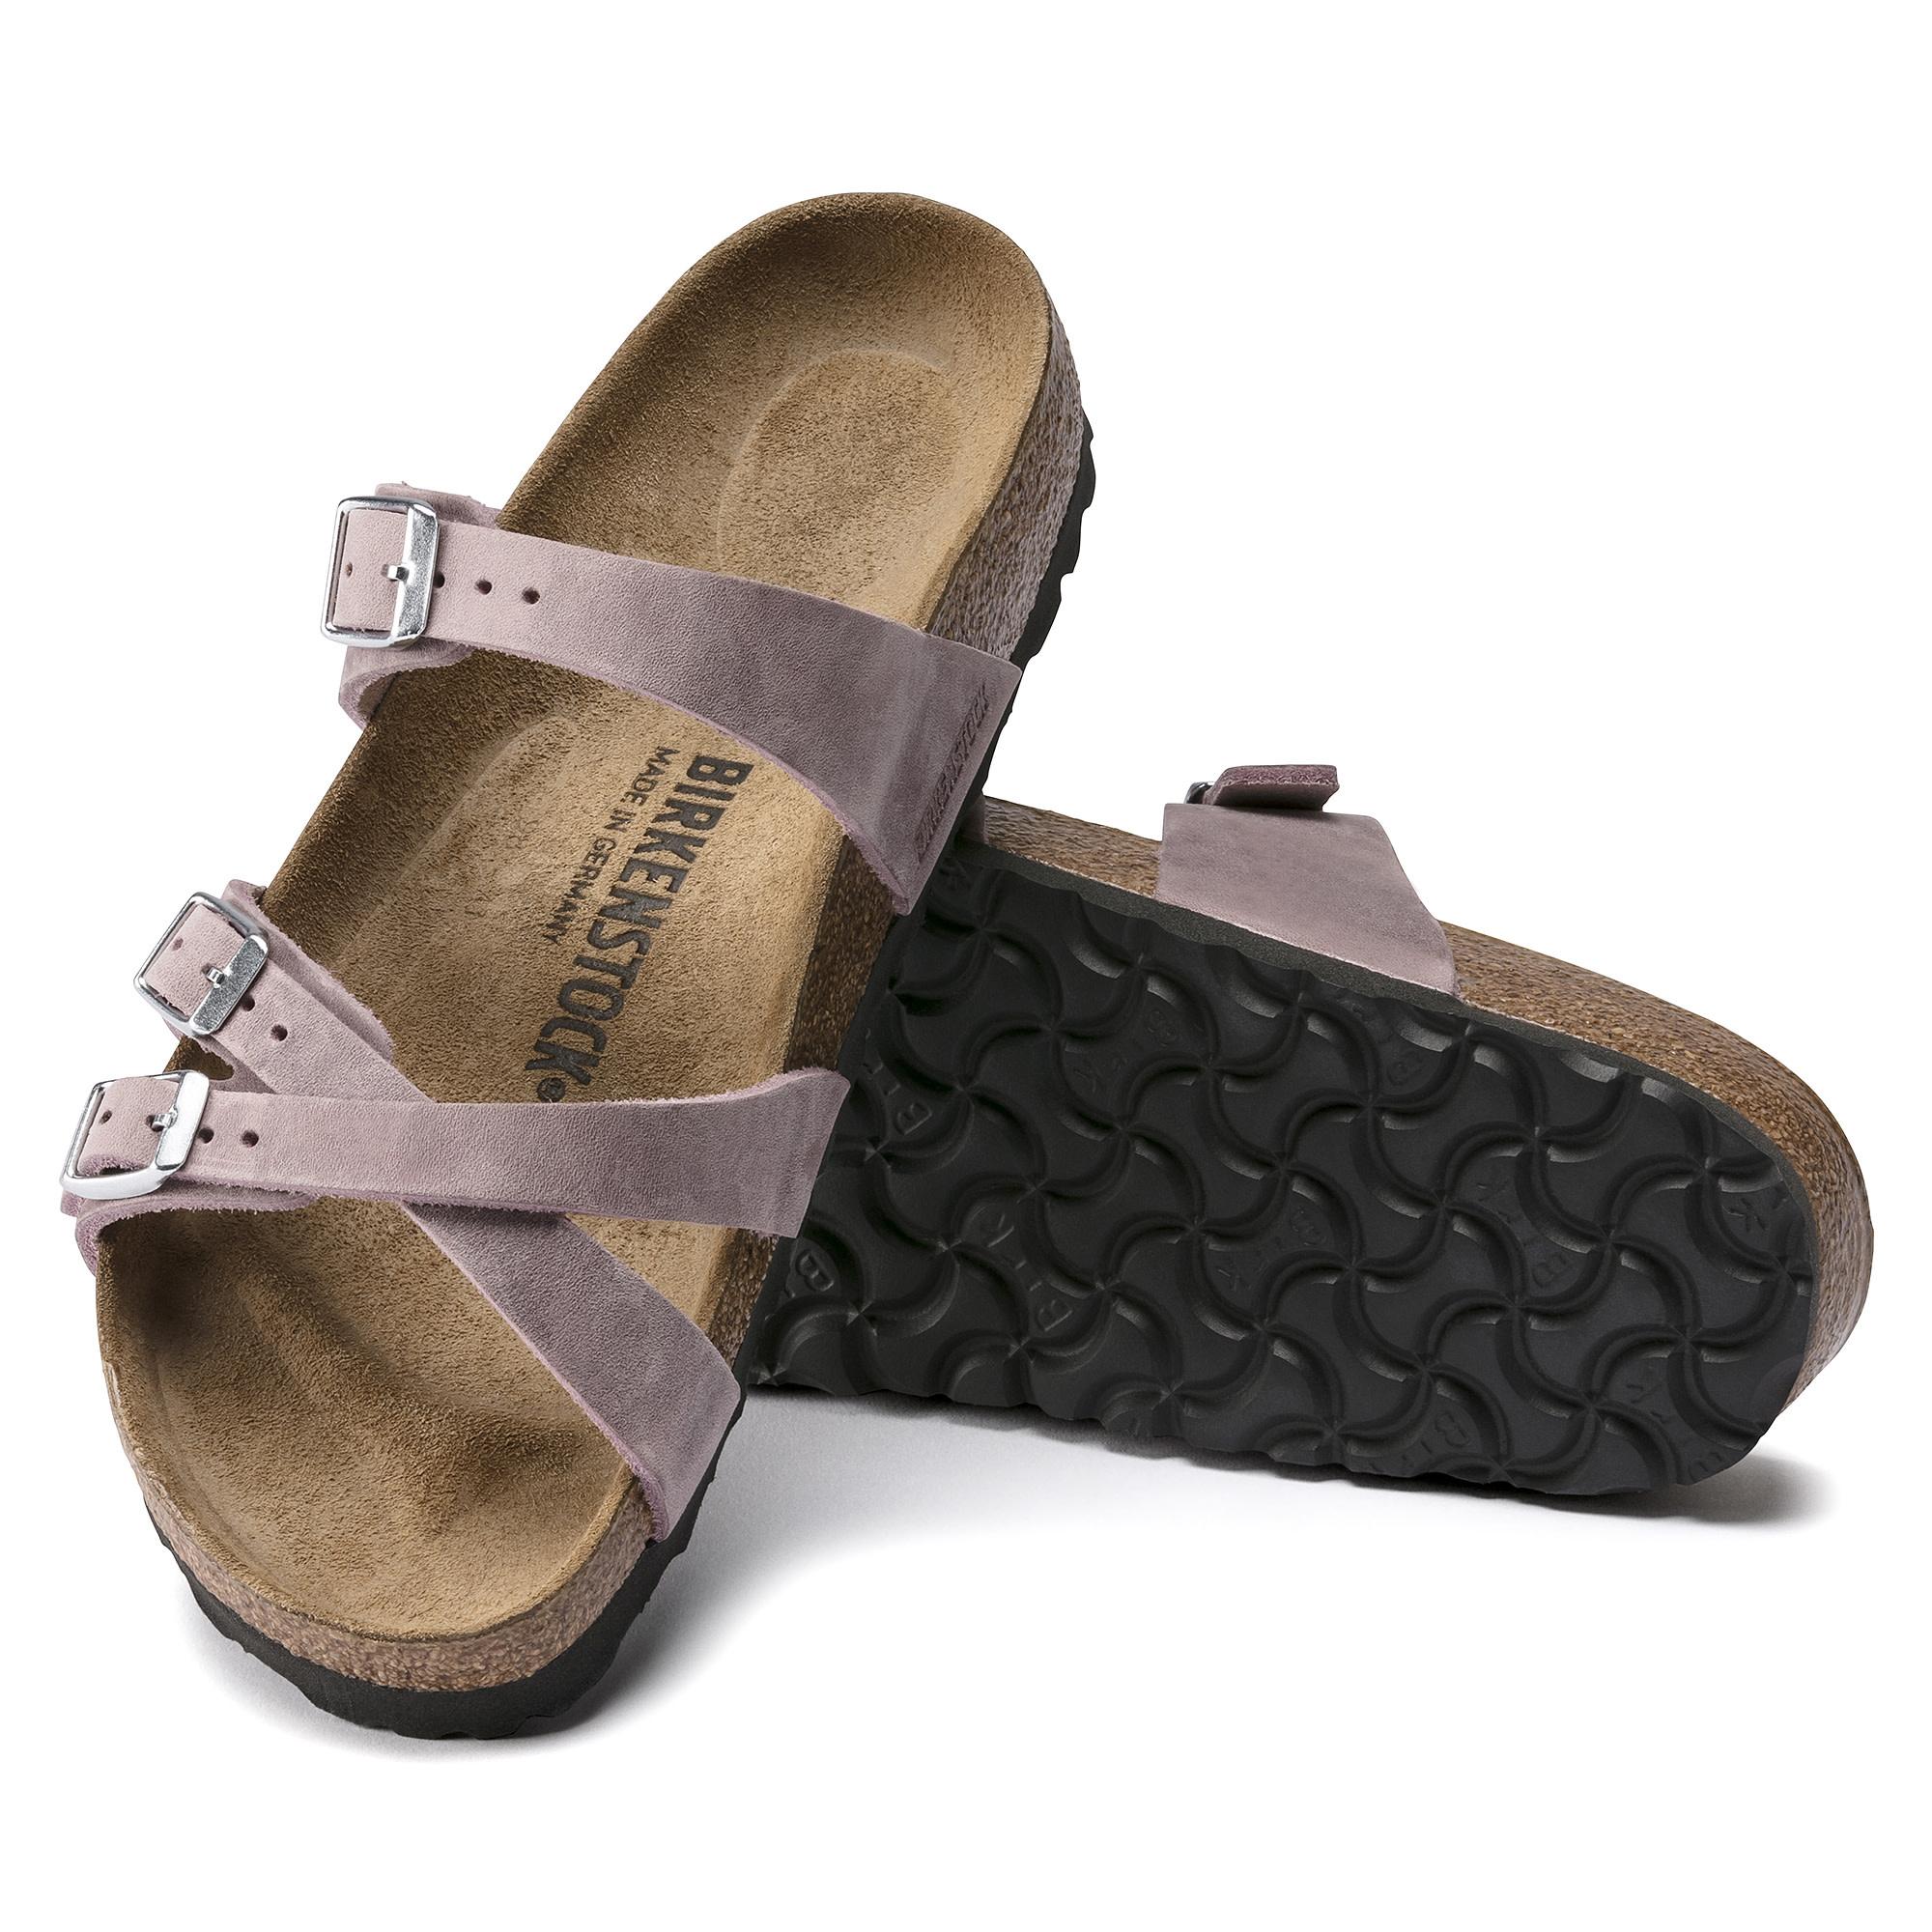 Birkenstock Birkenstock Franca Oiled Leather (Women - Narrow) - Lavander Blush